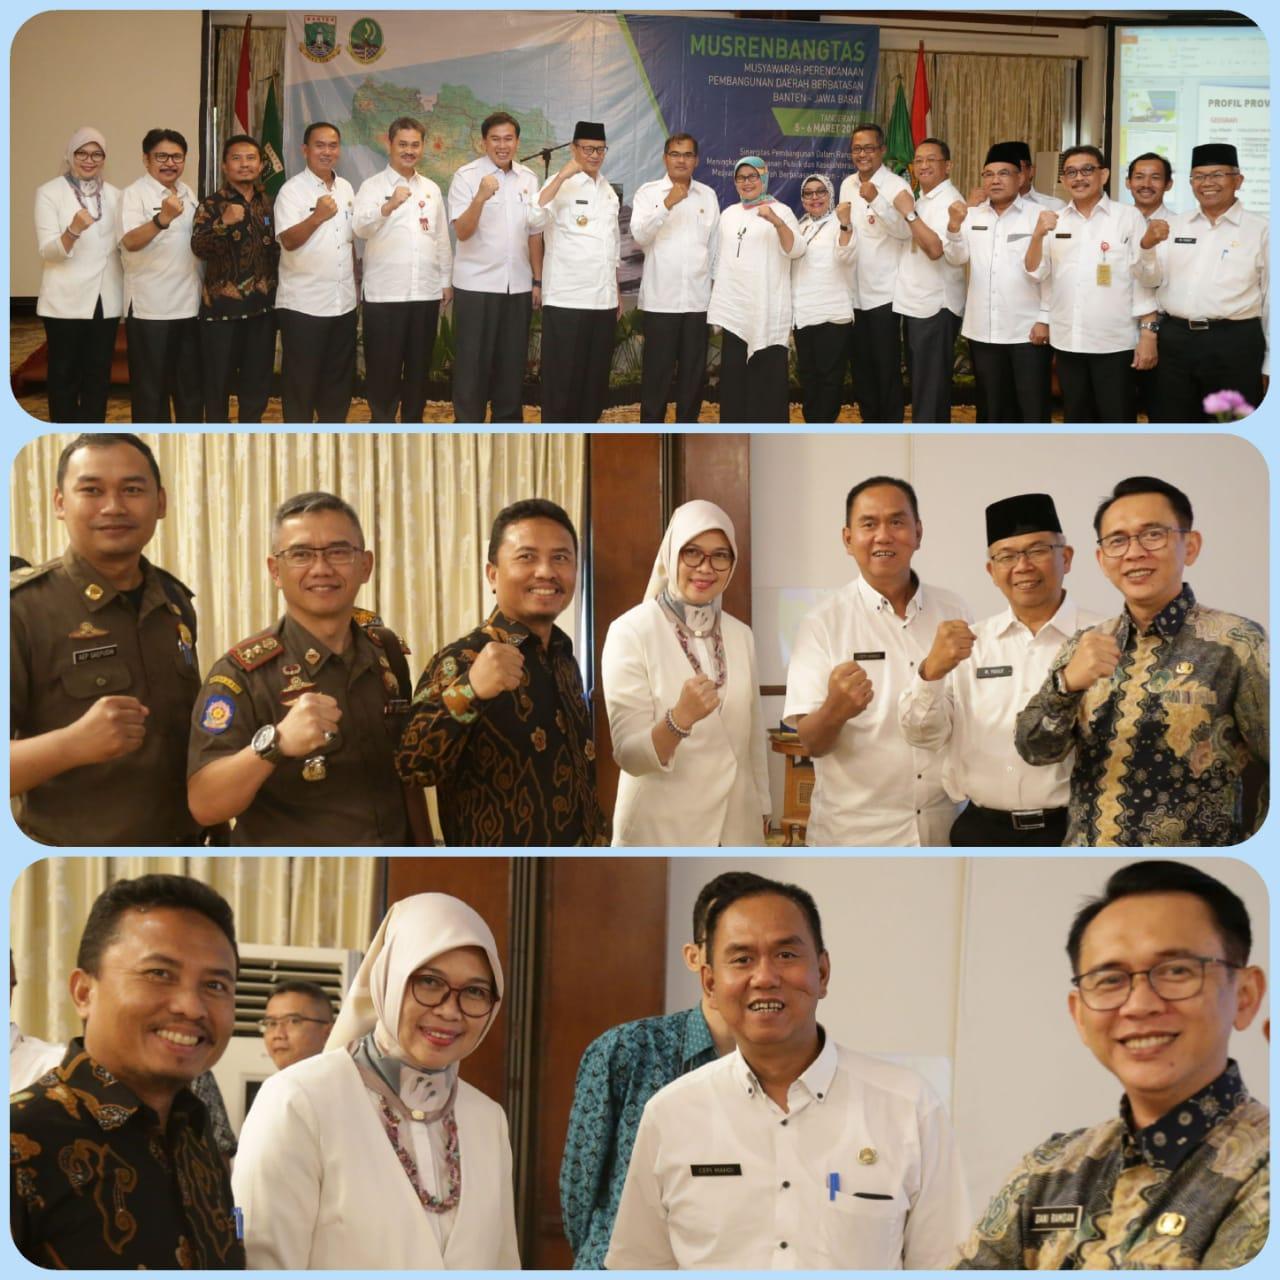 Musrenbangtas Banten - Jabar